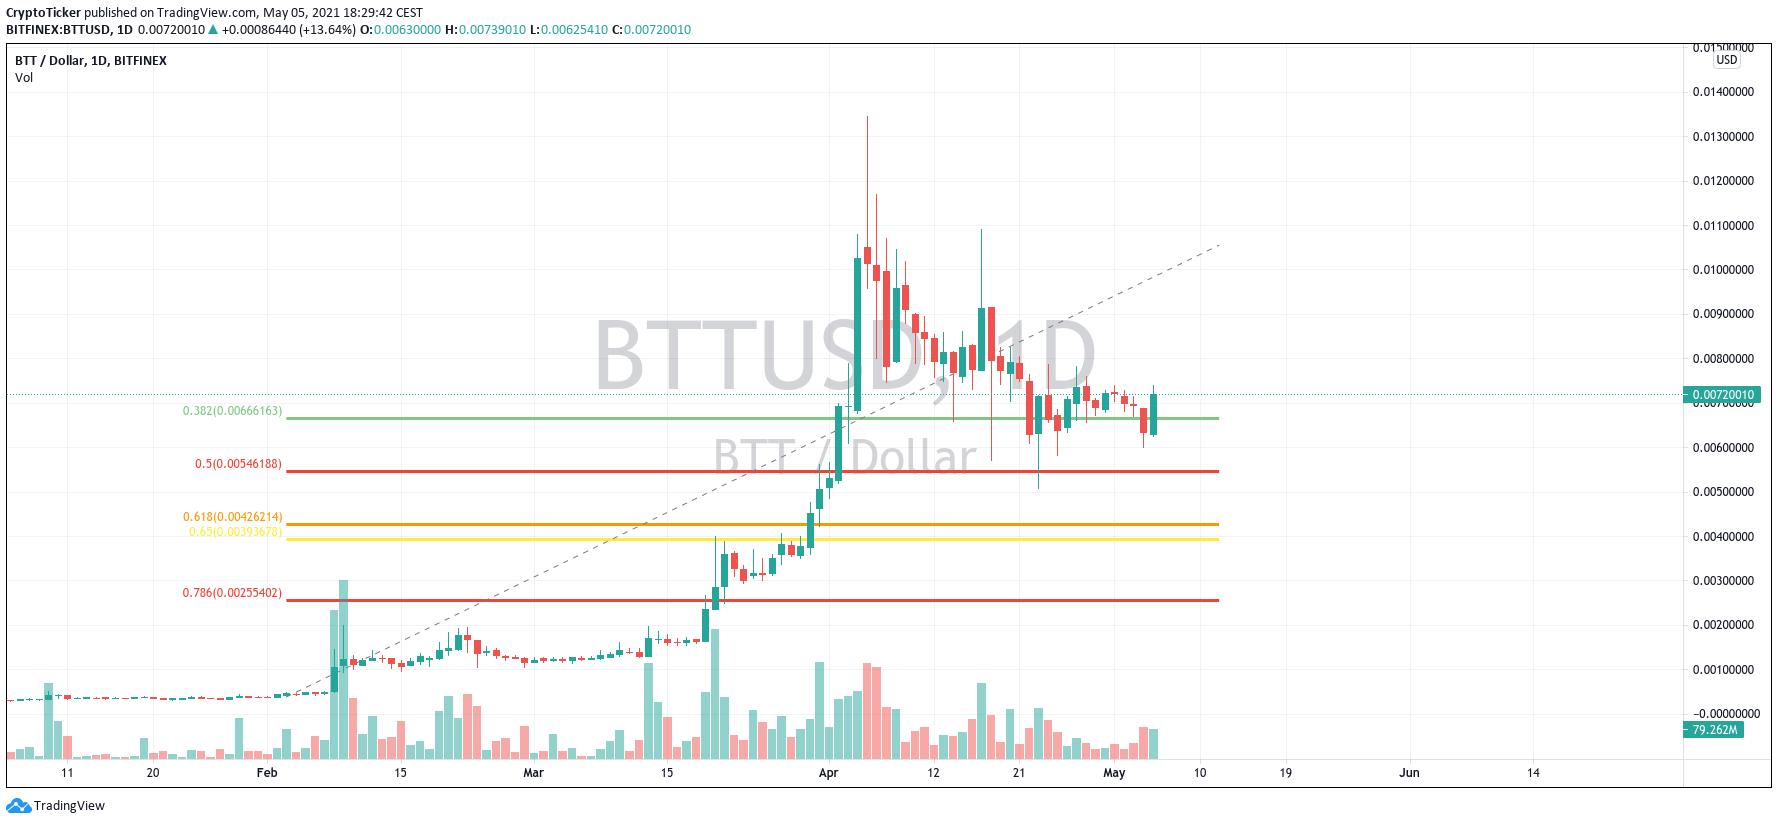 BTT/USD 1-day chart showing BitTorrent's price-action